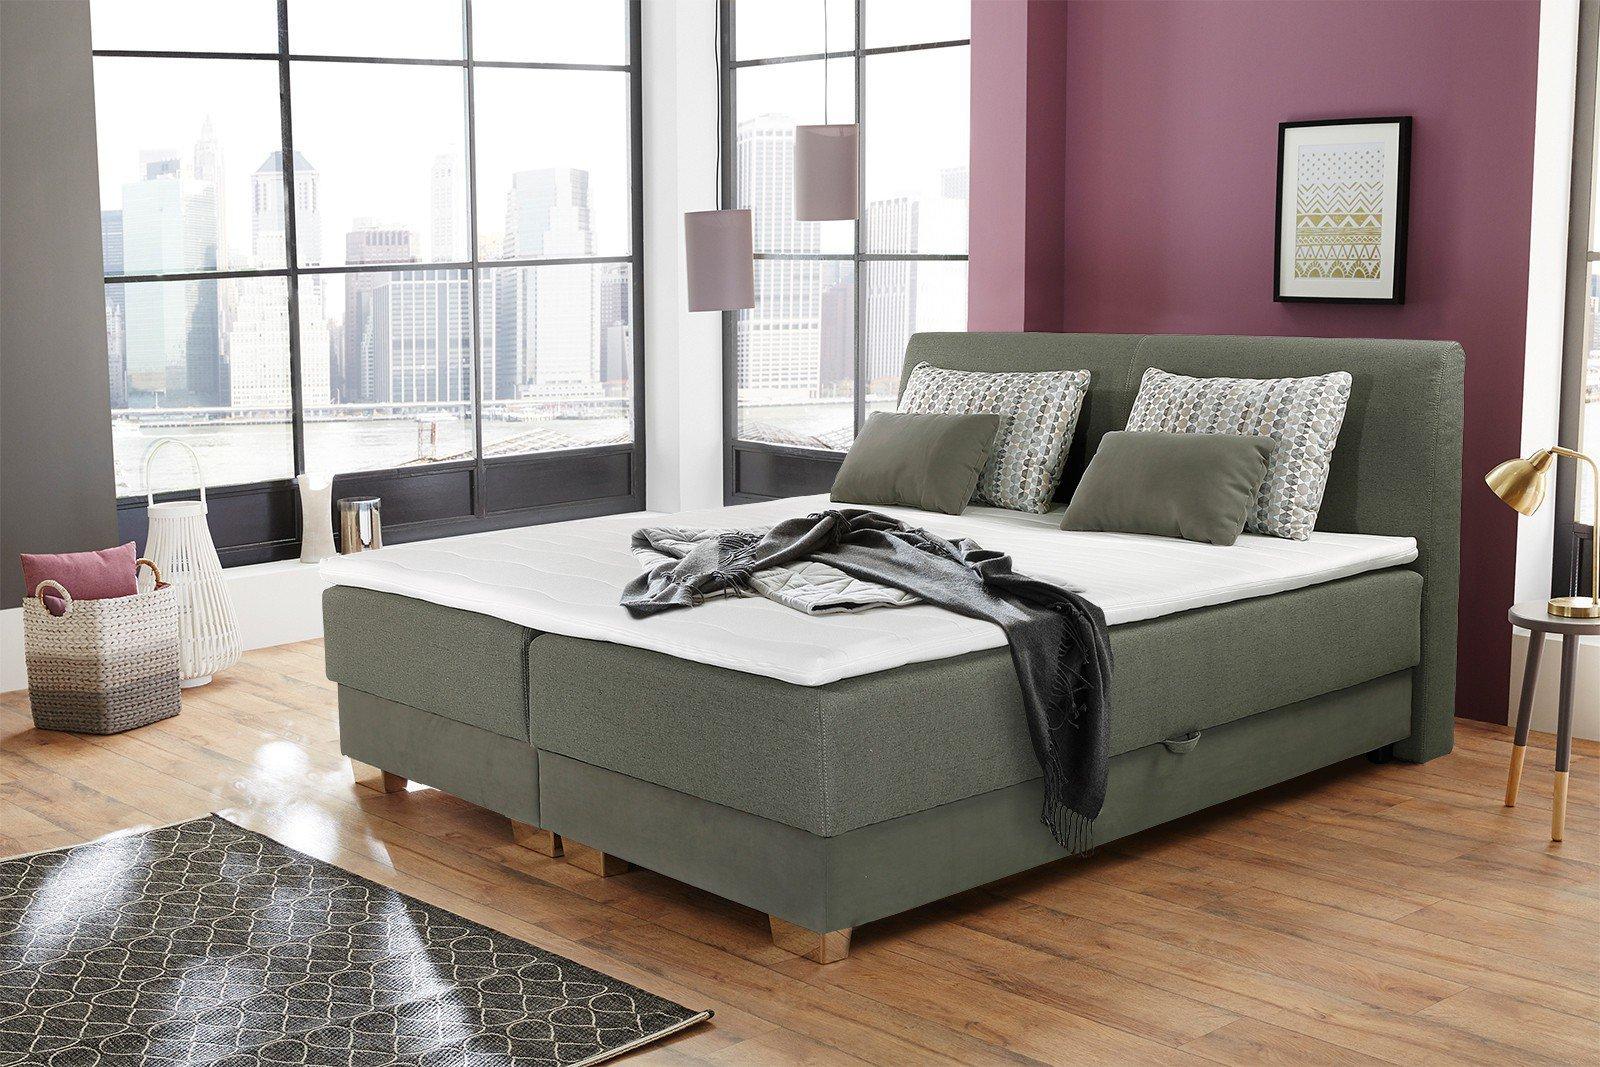 jockenh fer julie boxspringbett grau gr n mit bettkasten m bel letz ihr online shop. Black Bedroom Furniture Sets. Home Design Ideas